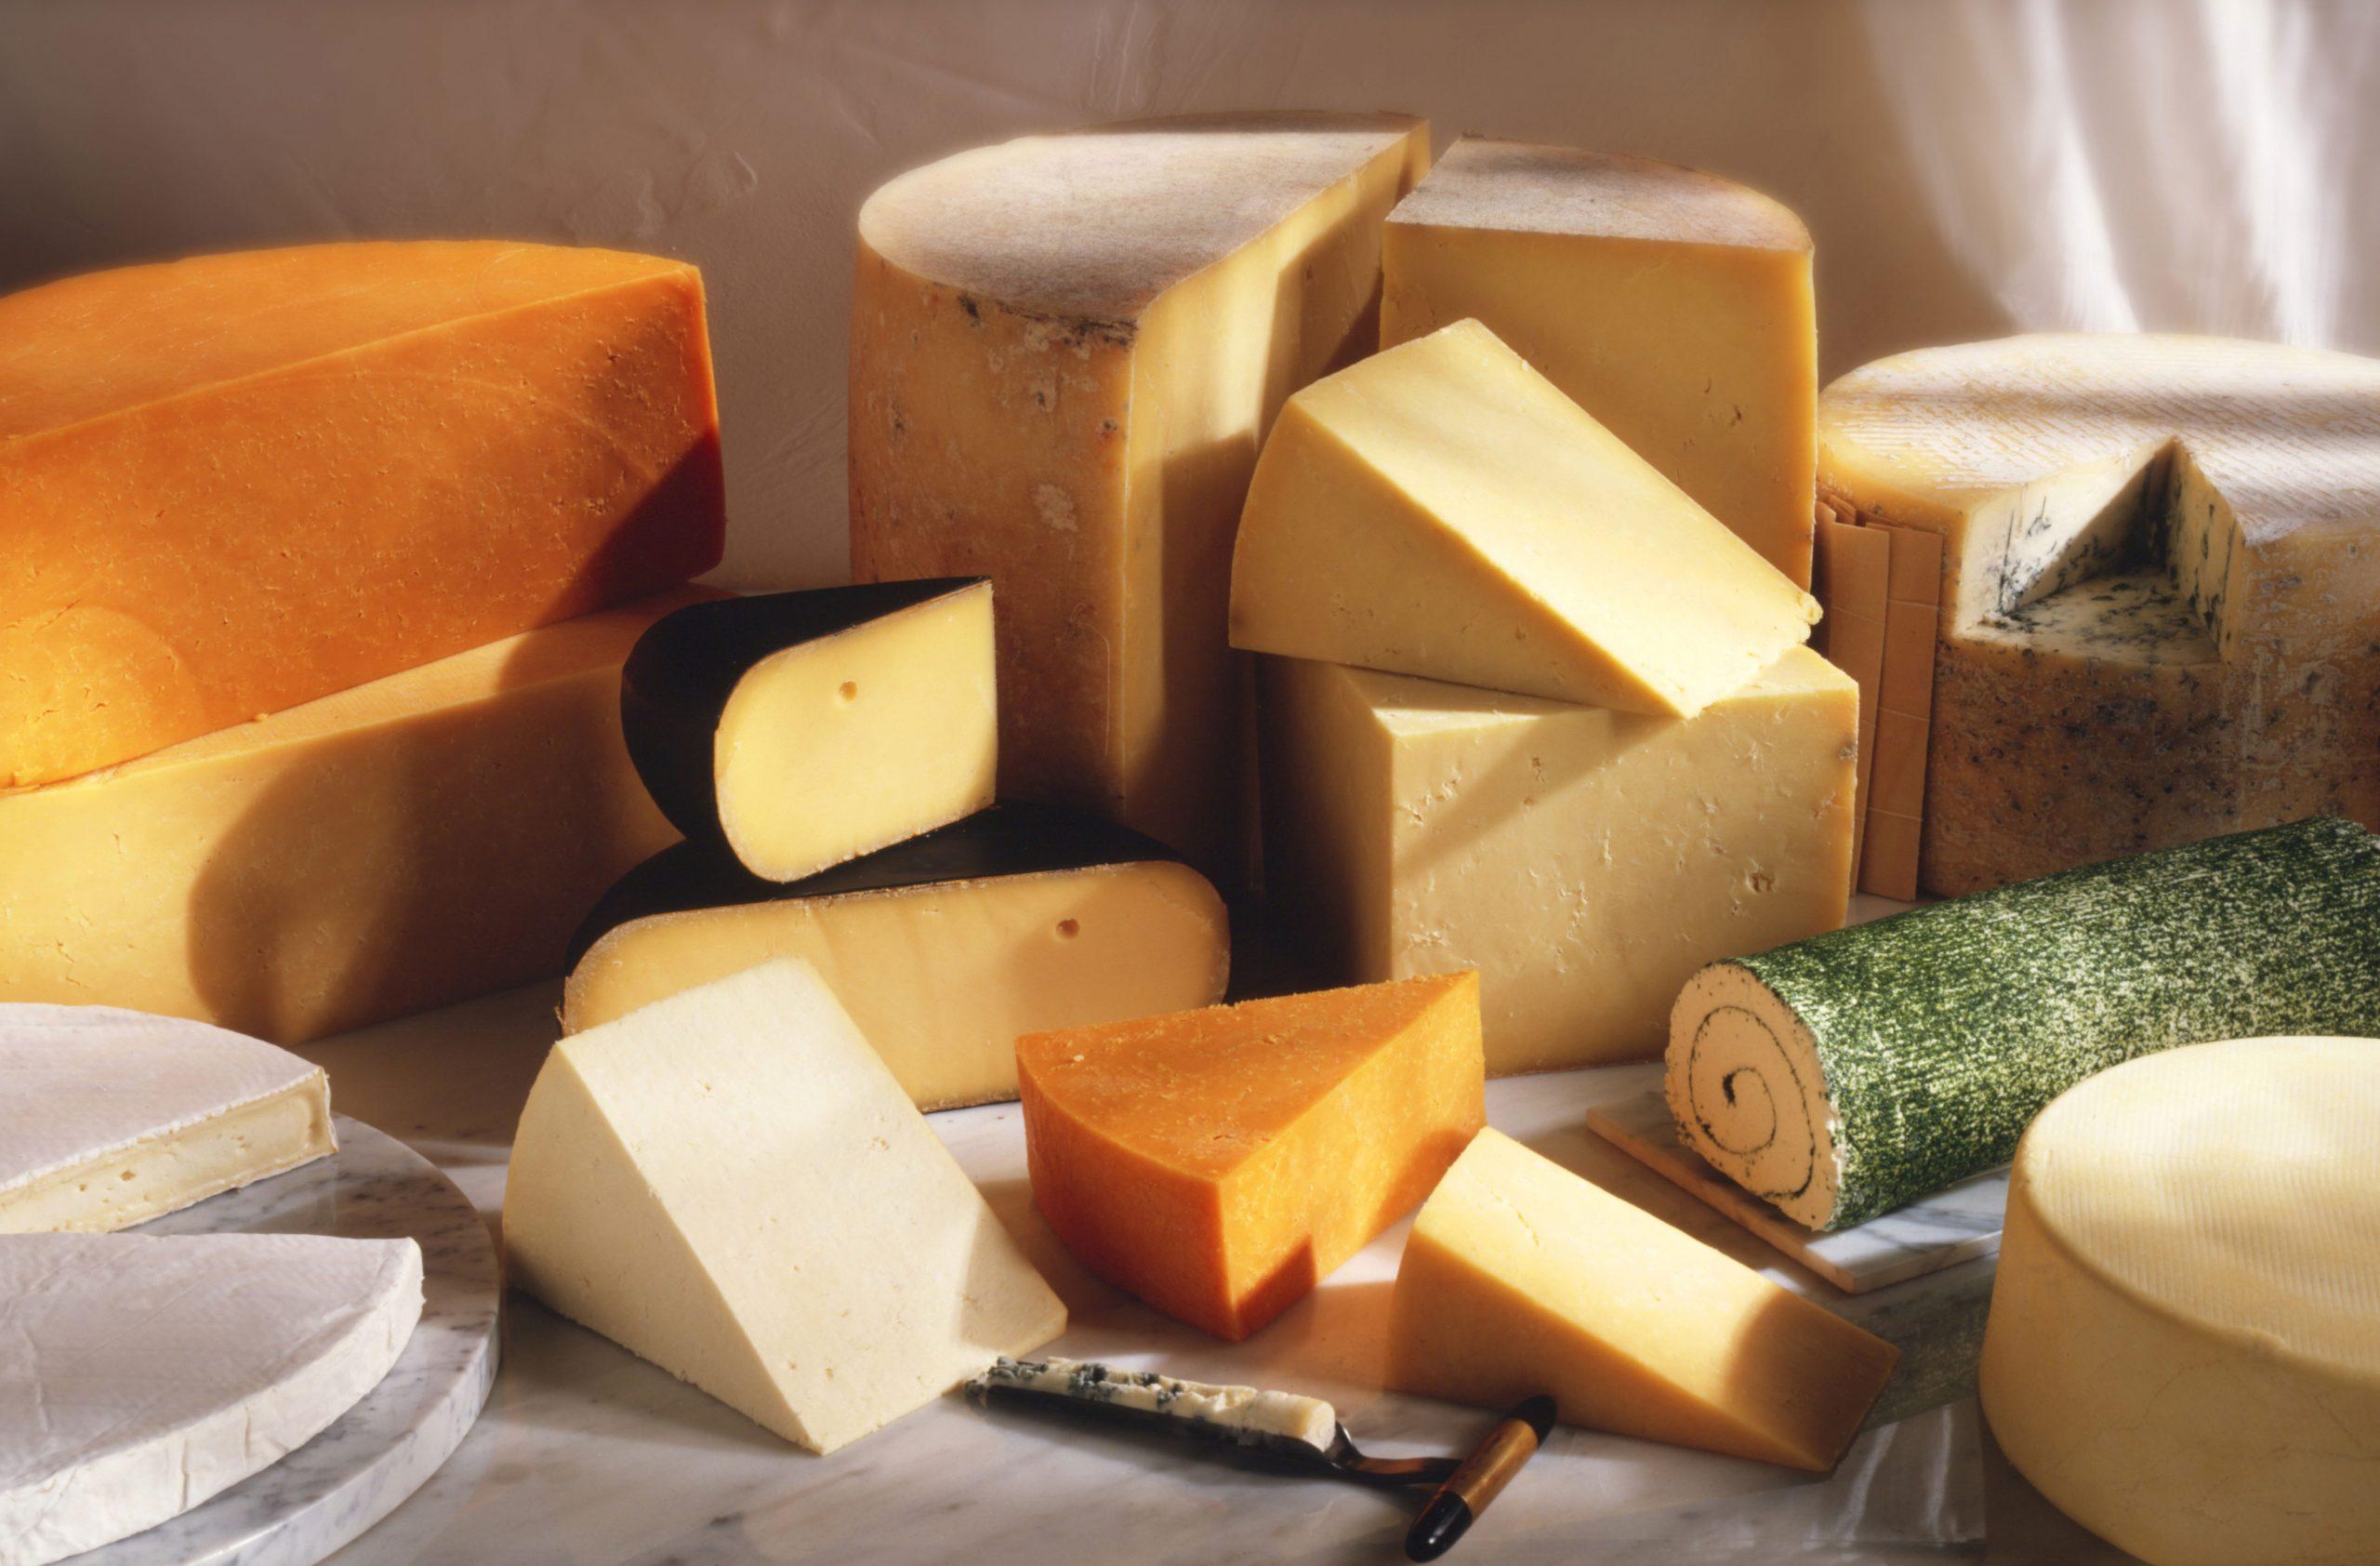 Healthiest cheese